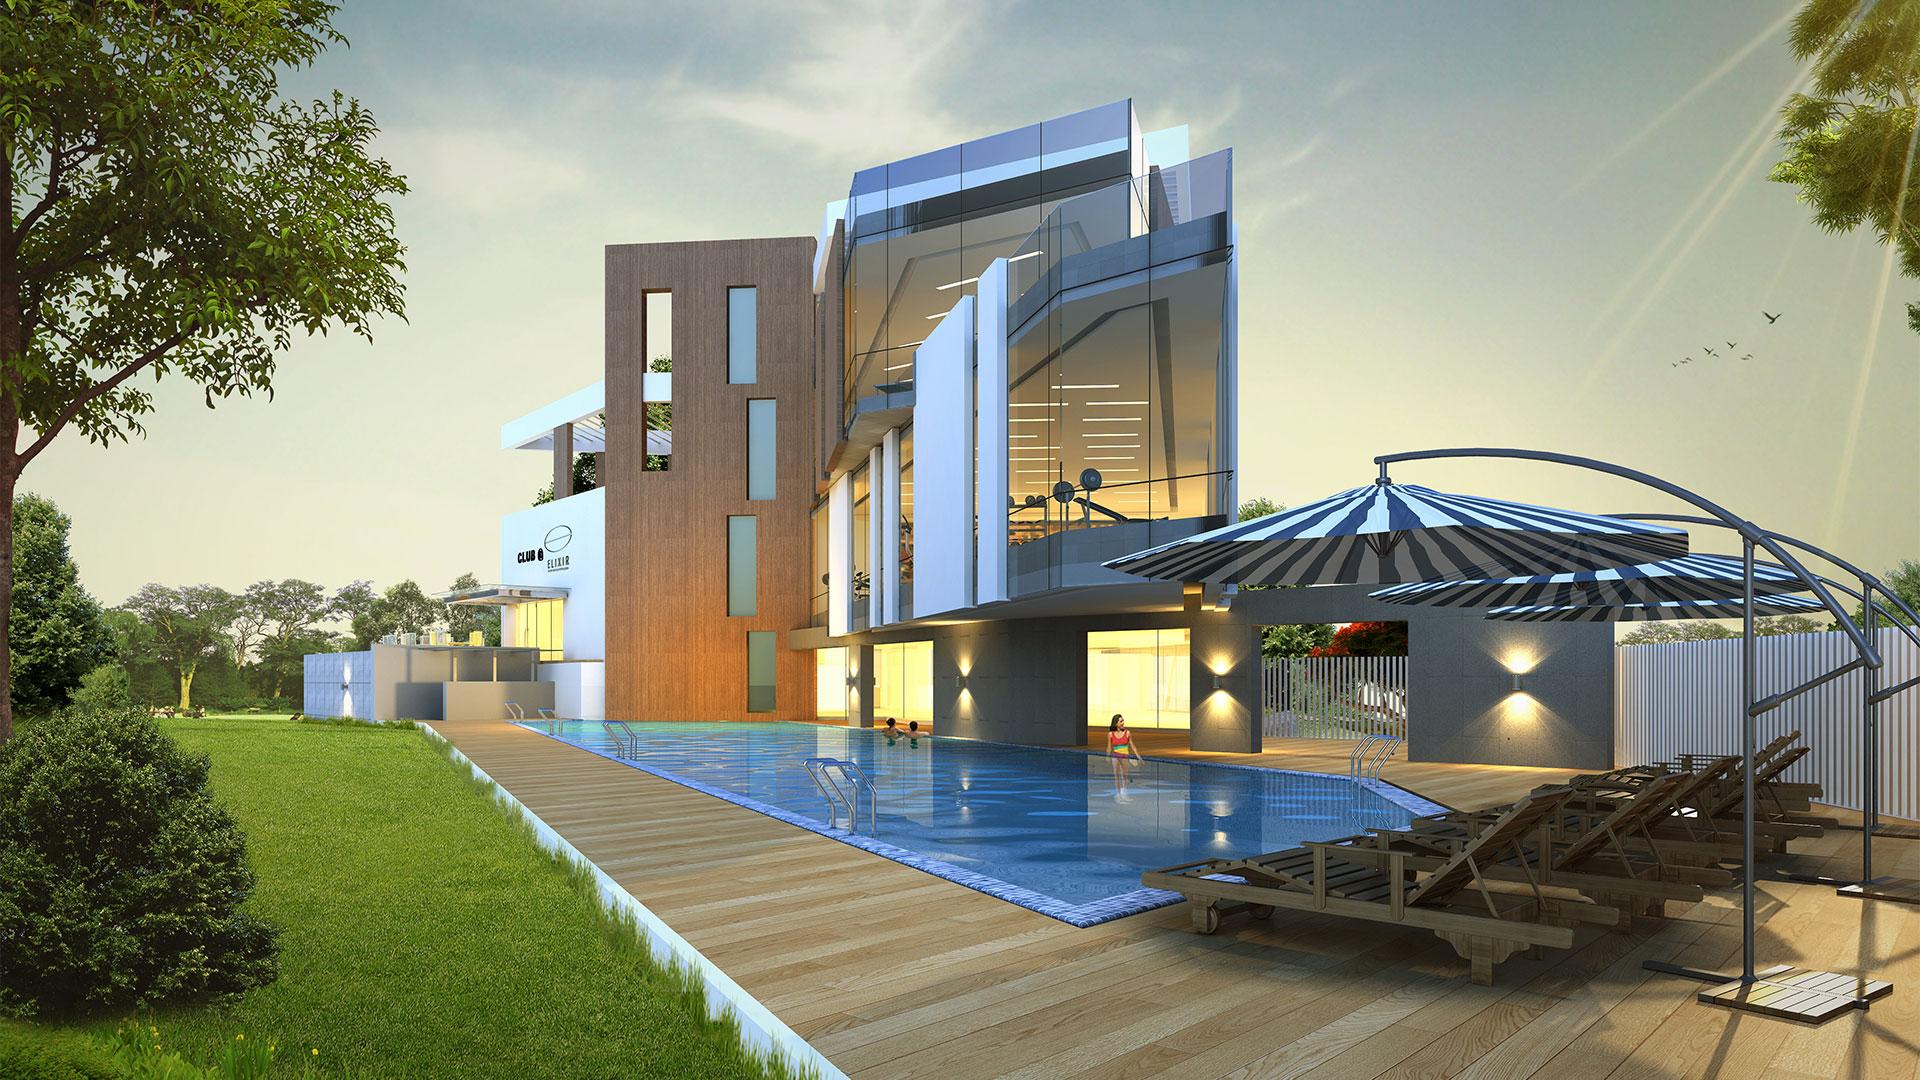 4 bhk villas for sale in hyderabad aparna elixir for Villa interior design in hyderabad